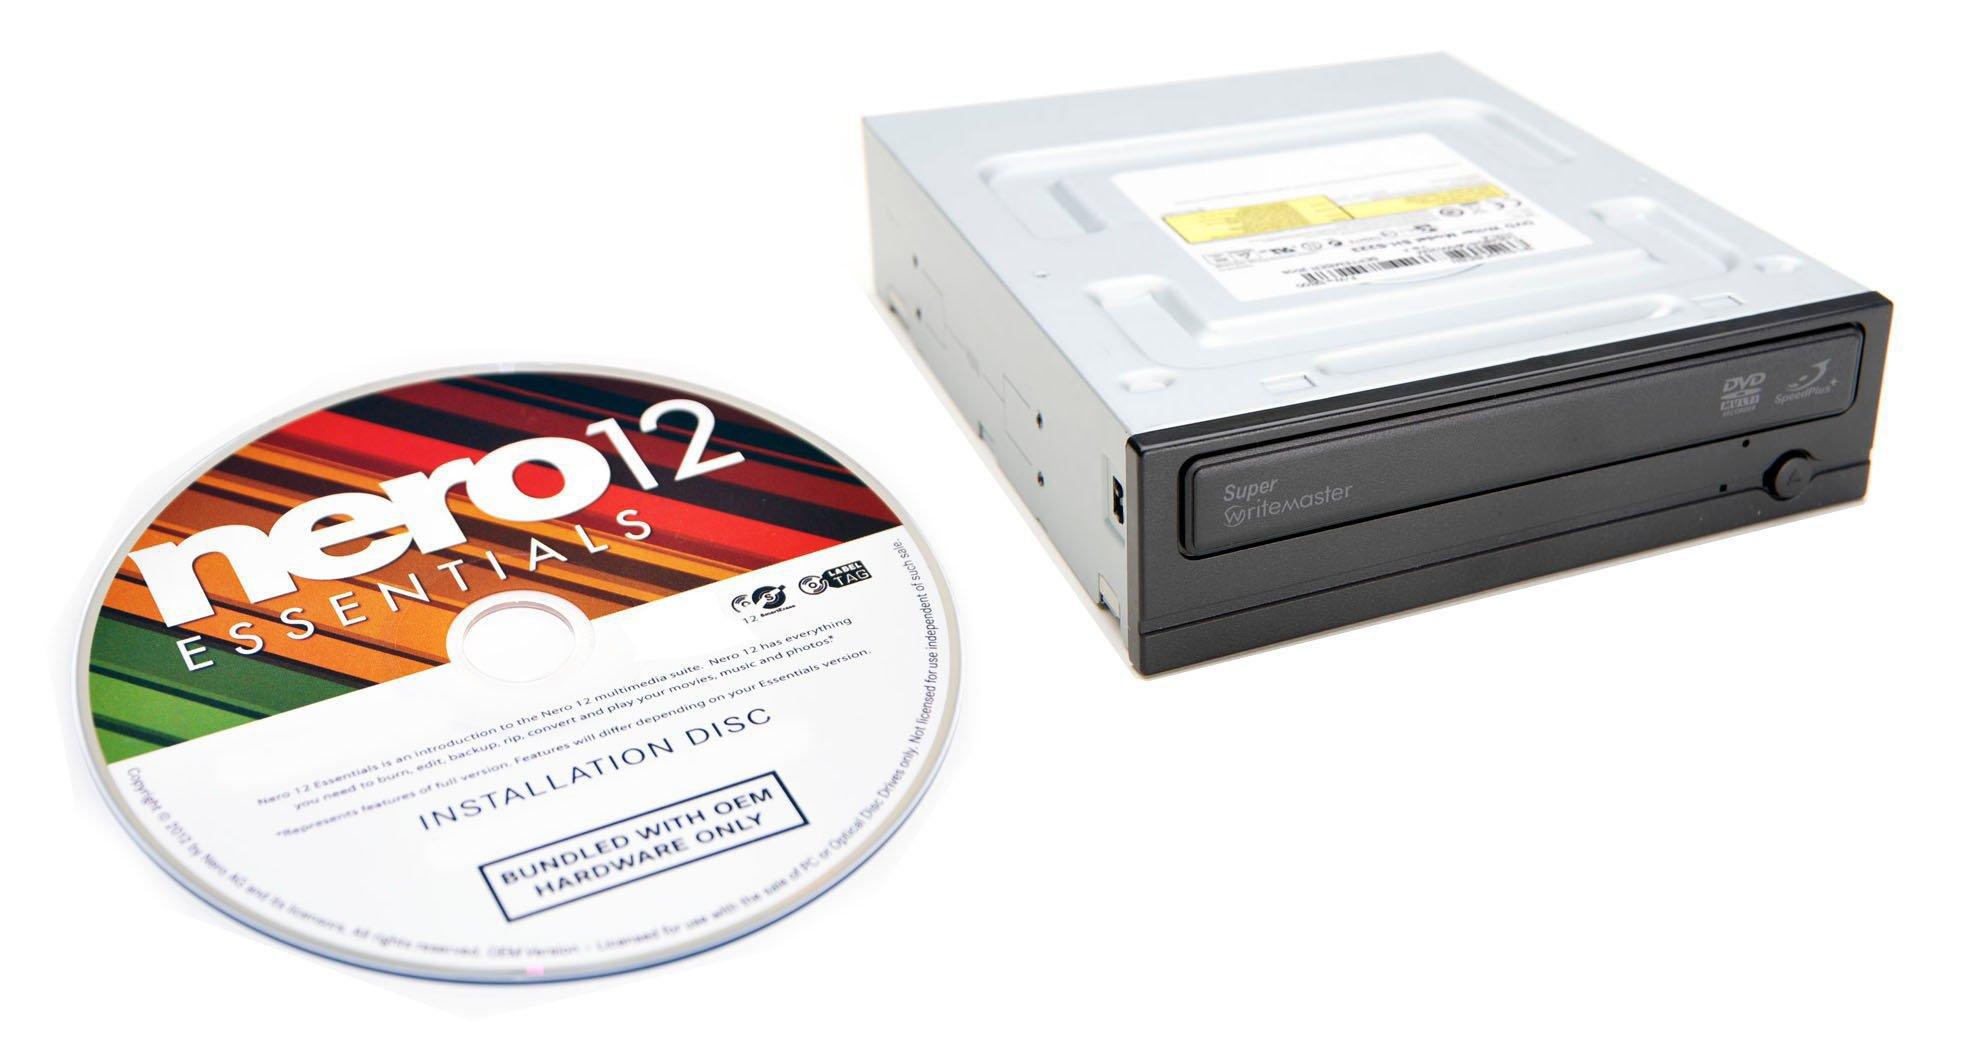 Samsung 24x SATA DVD Burner Internal Drive SH-224DB/BEBE (Black) Bulk + Nero Multimedia Suite 12 Essentials CD/DVD Burning Software